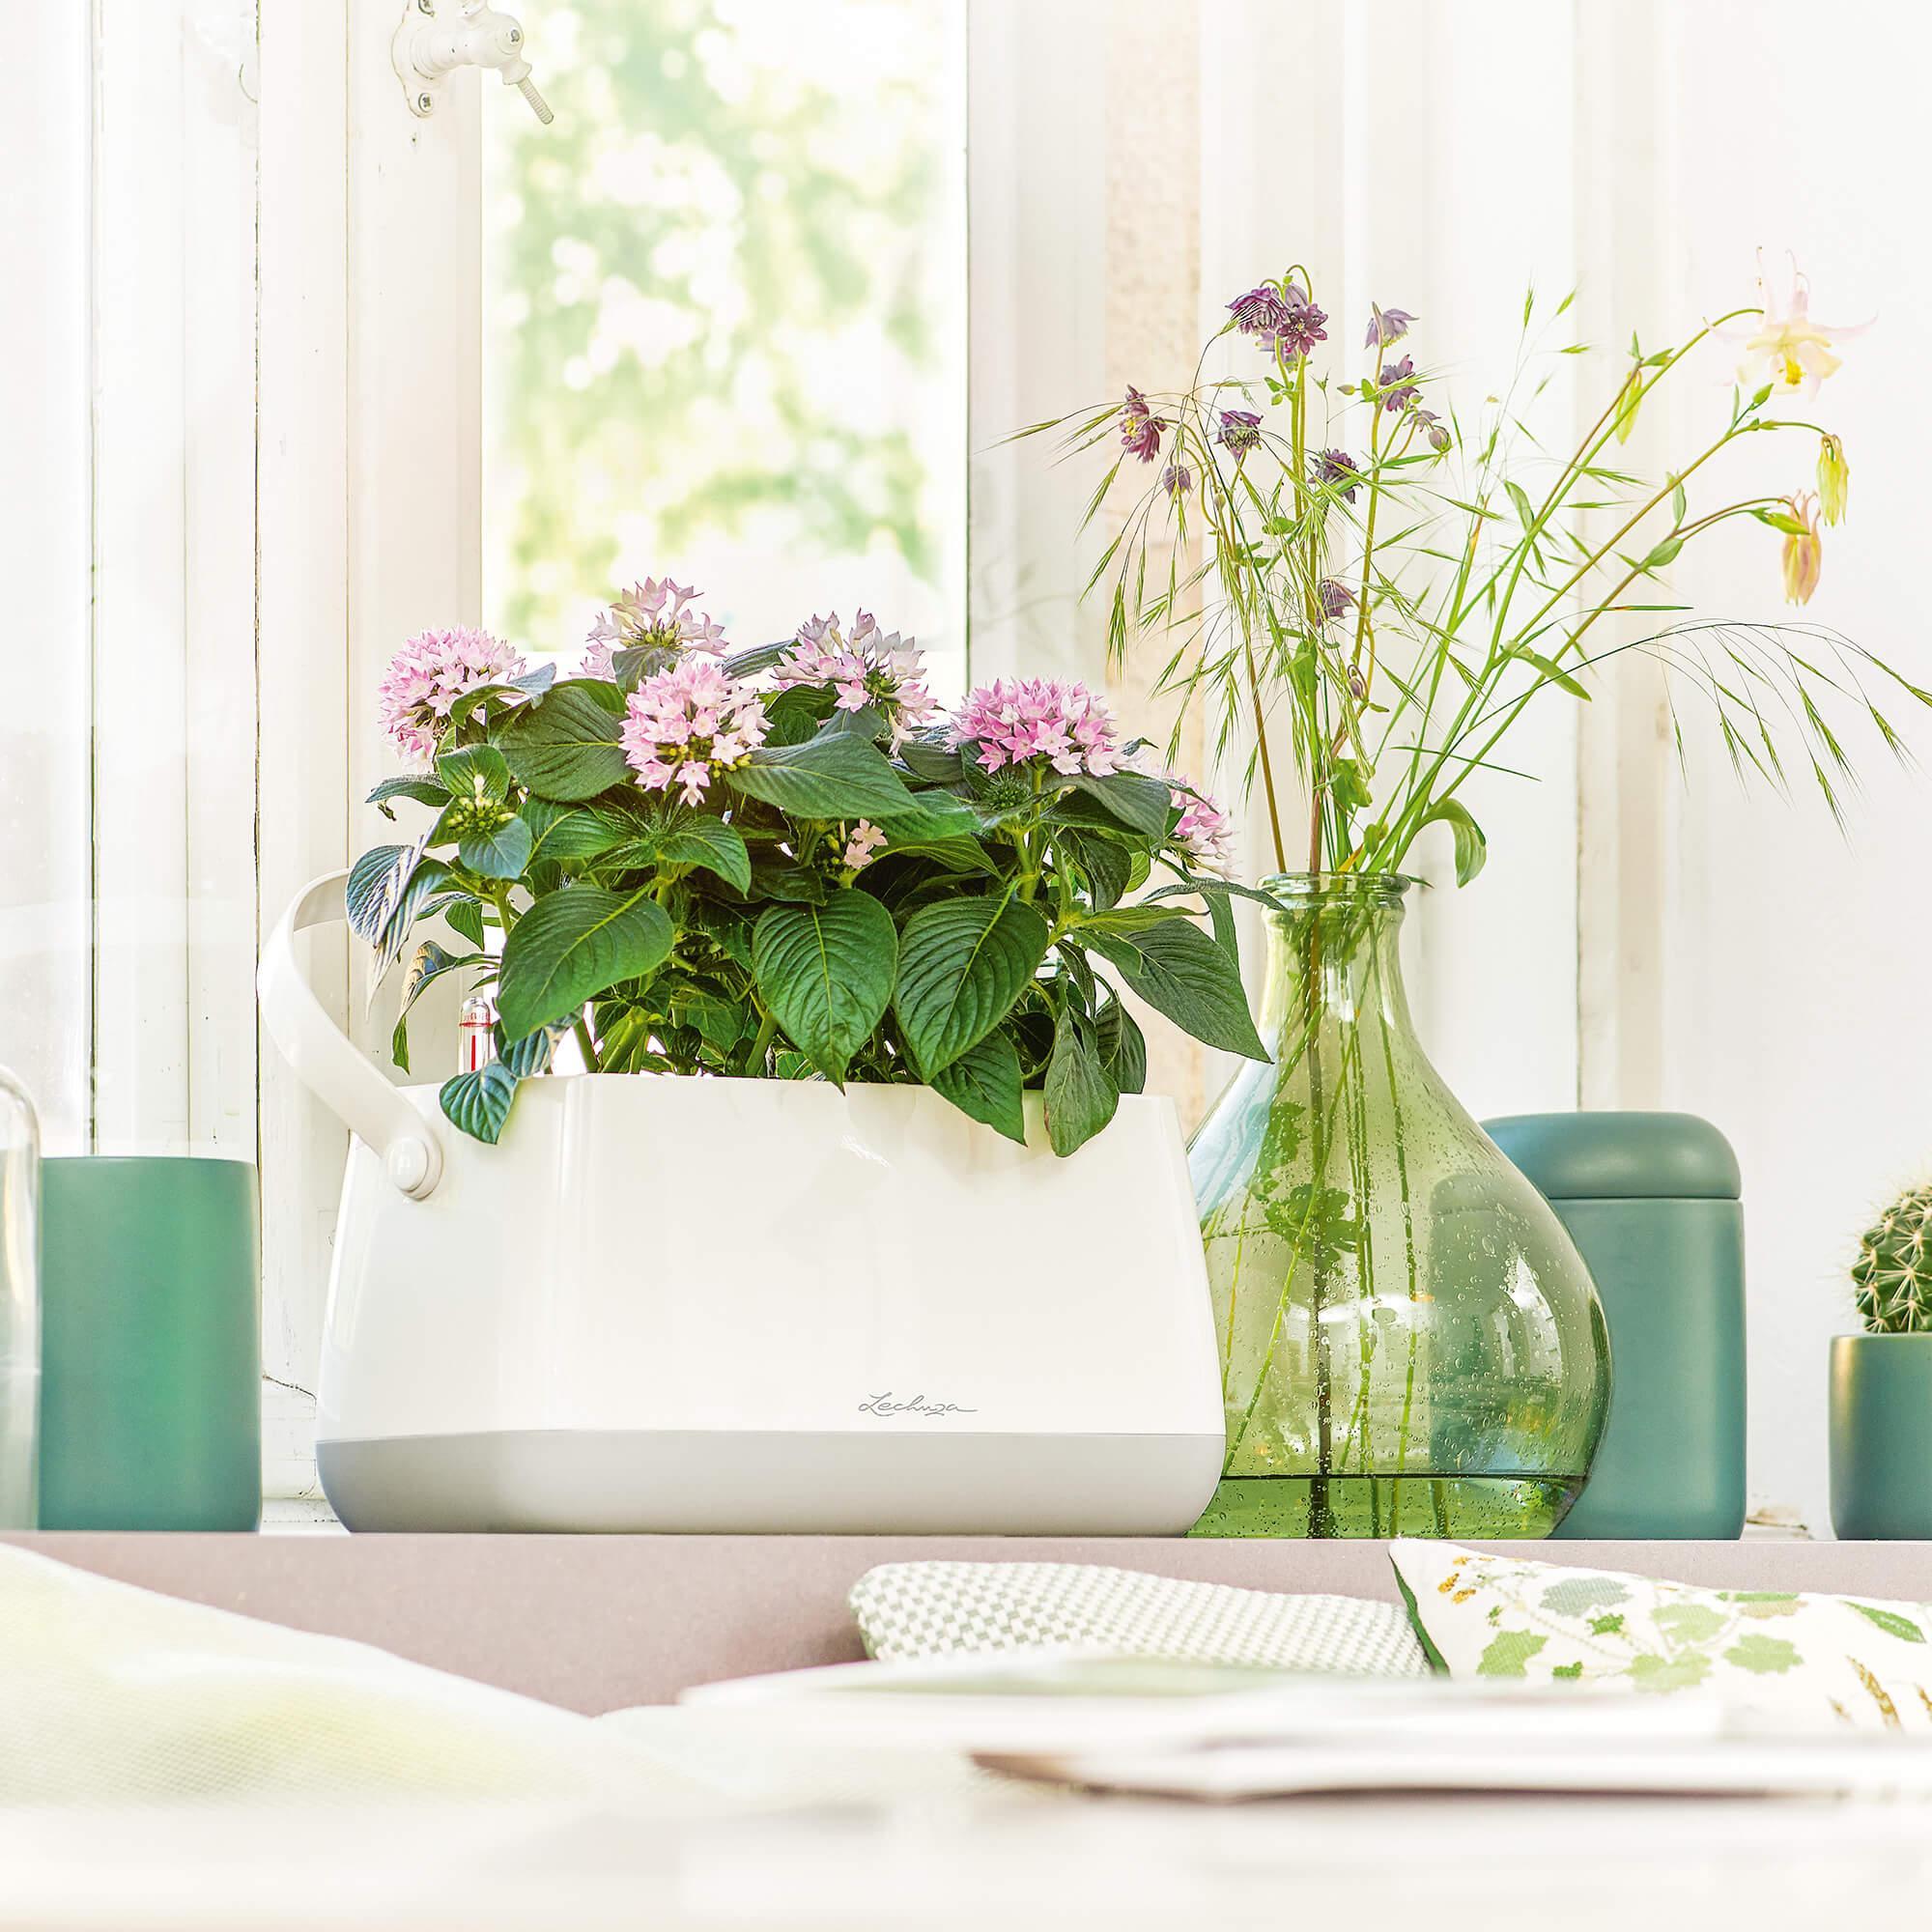 YULA plant bag white/gray semi-gloss - Image 5